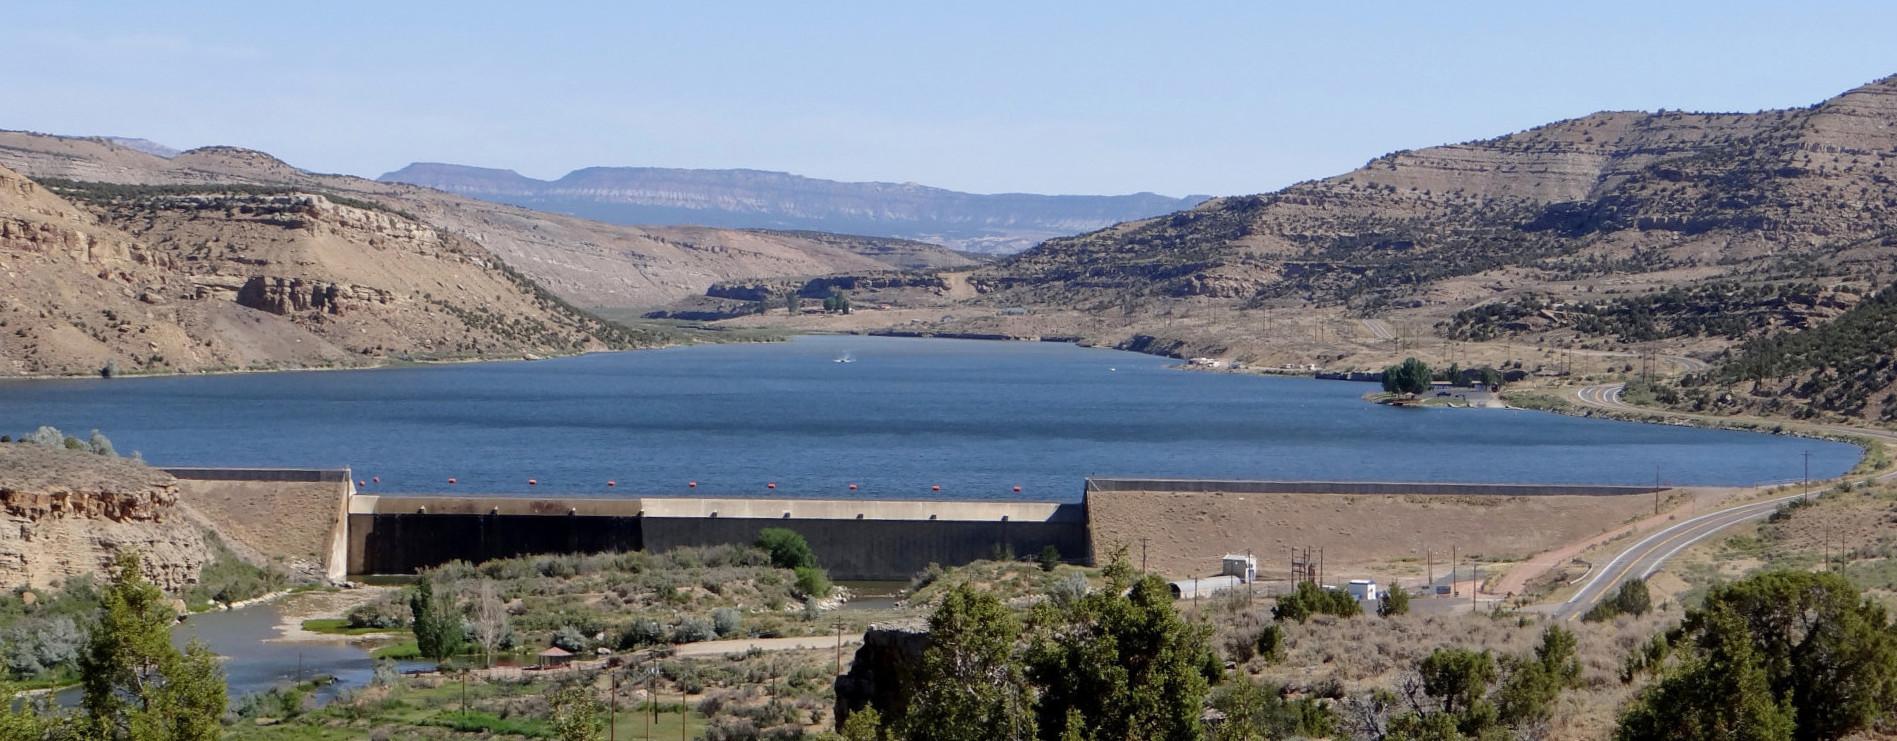 Kenney Reservoir Dam